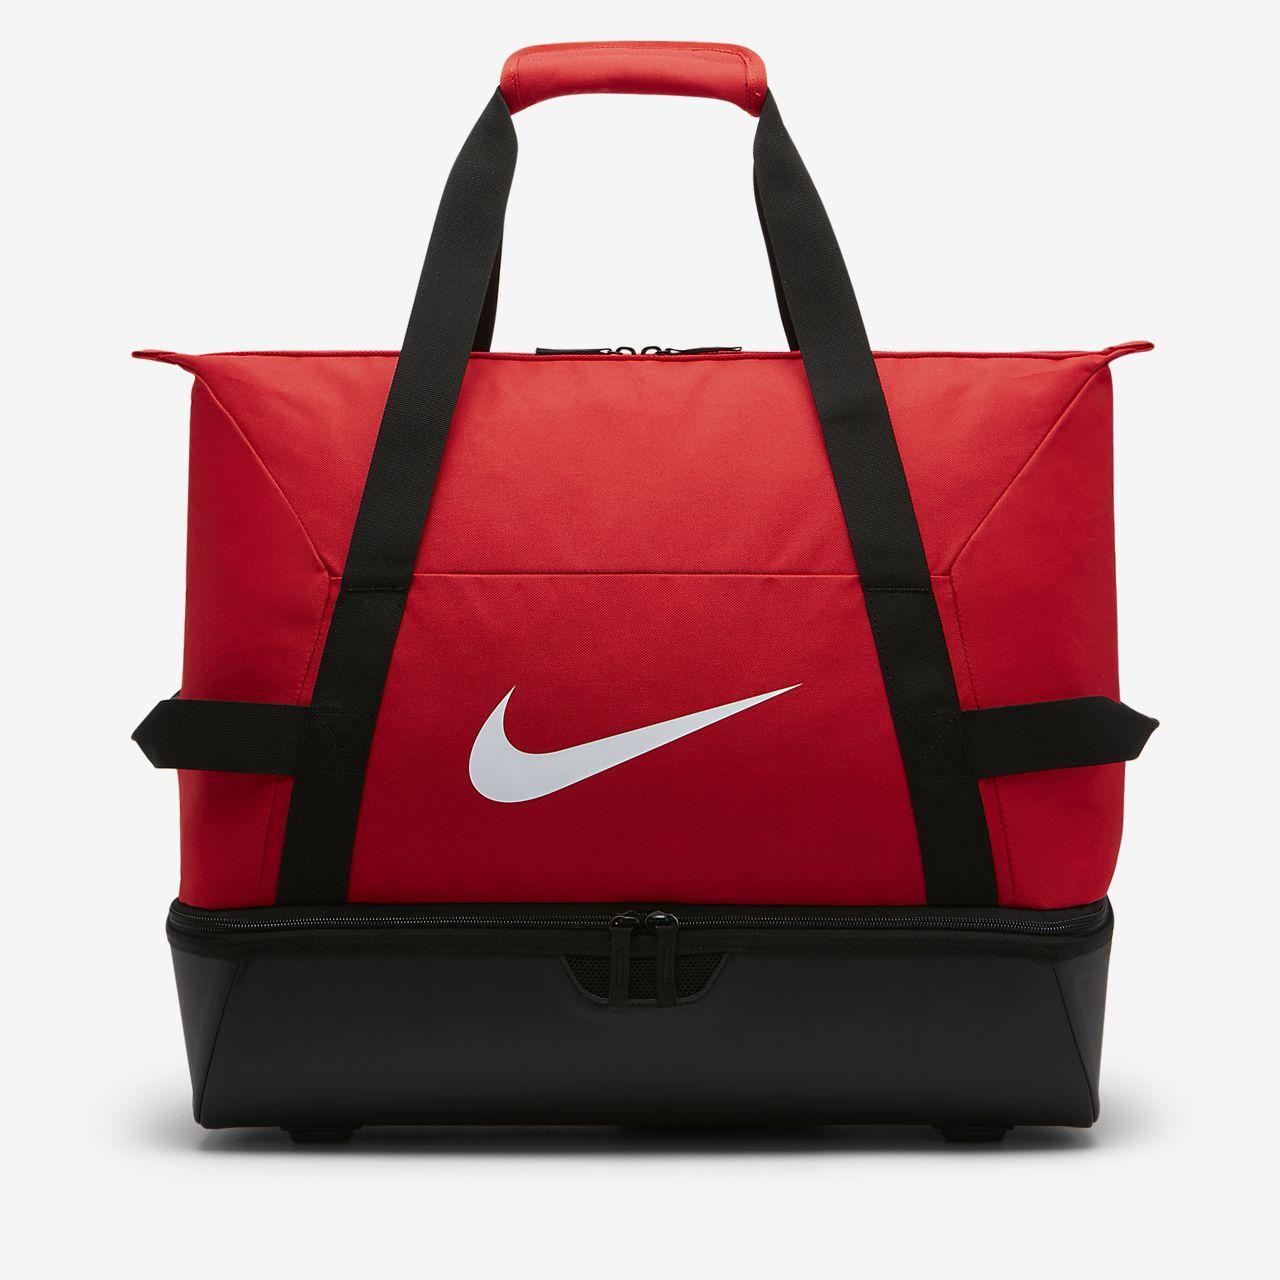 Nike Academy Team Hardcase Bolsa de deporte de fútbol (Grande). Nike ... 61a2789353e34